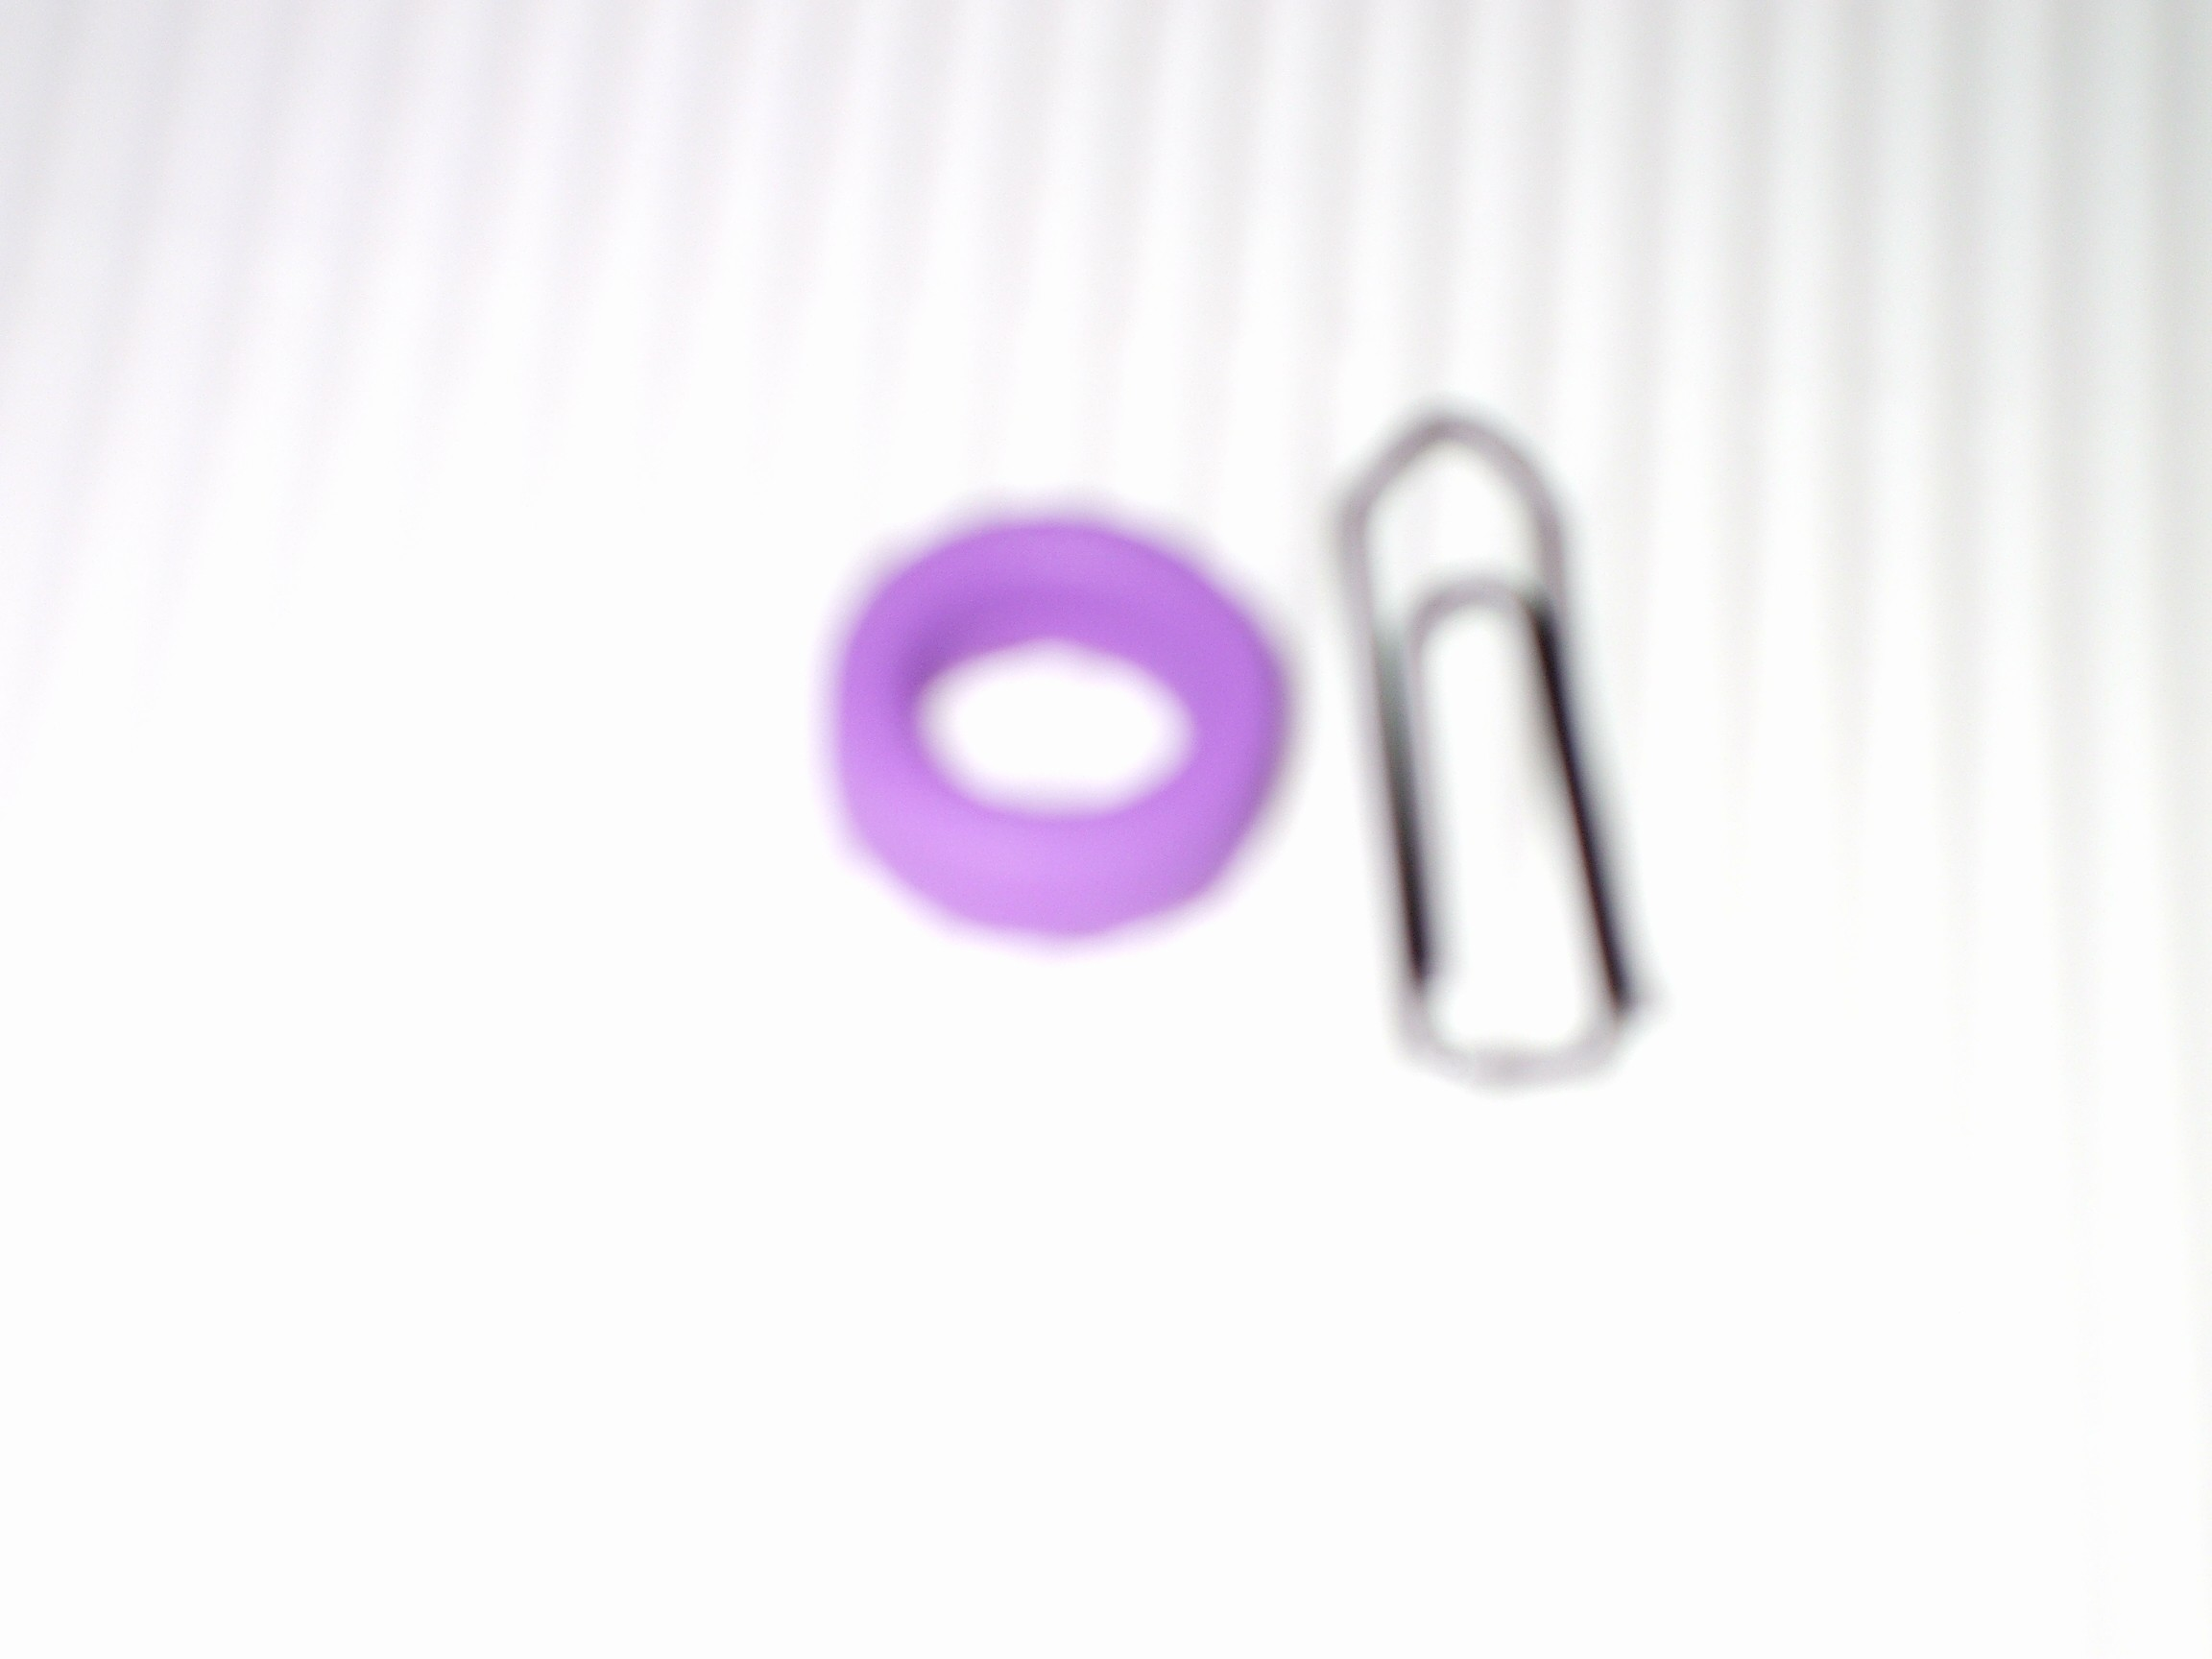 Ferrit-Ringkern 14mm TN14/9/5, 4C65, AL55, violett oder weiß